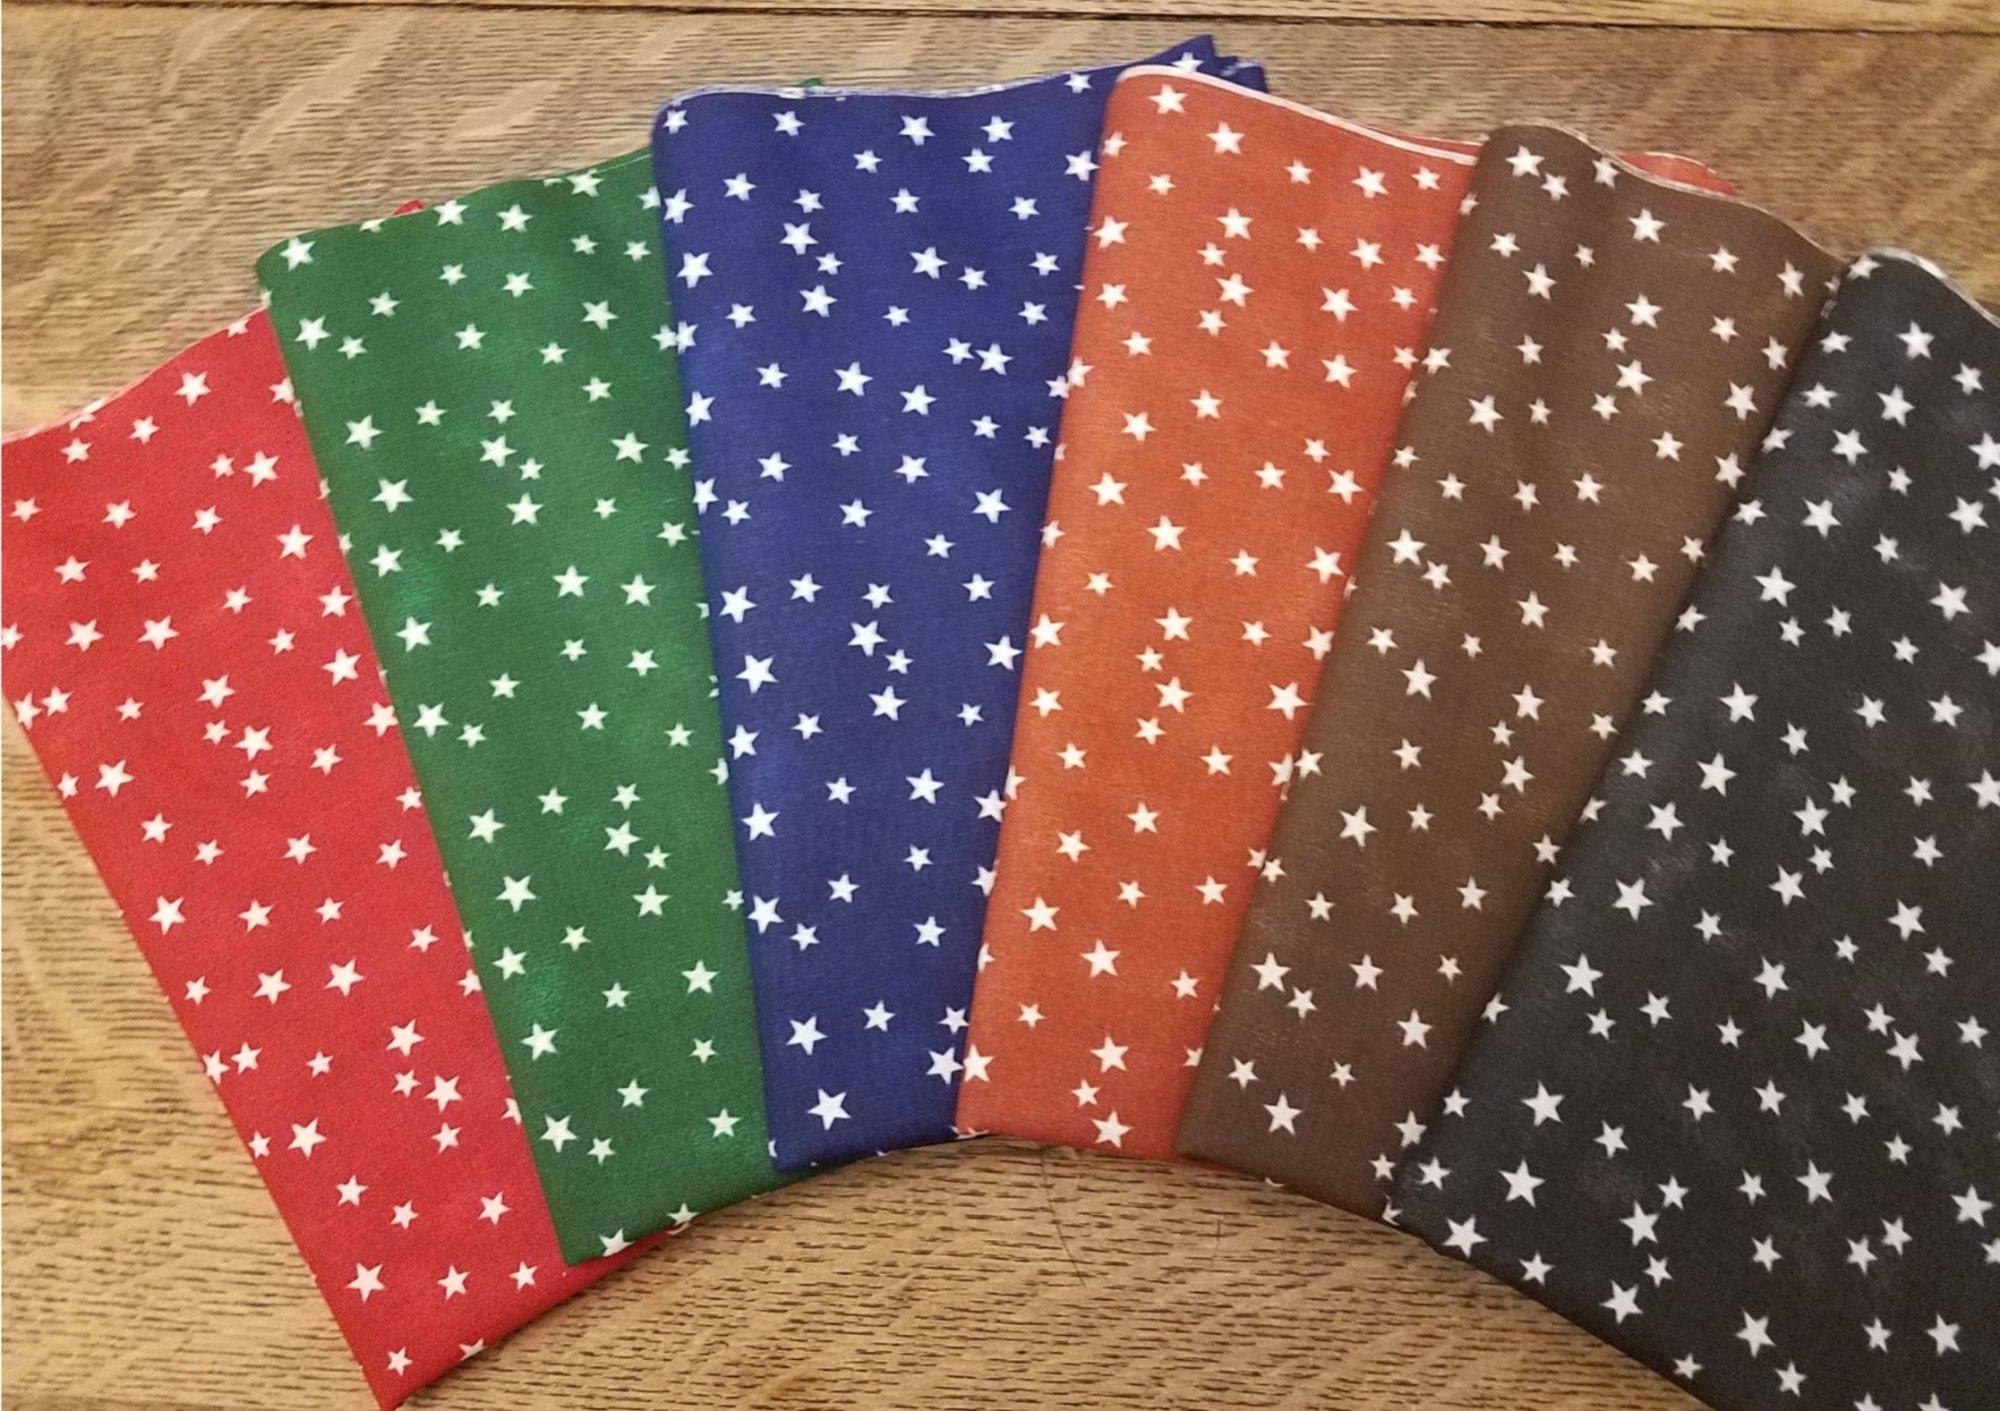 Random Stars - Rachael's Picks - 6 Piece Half Yard Bundle Pack